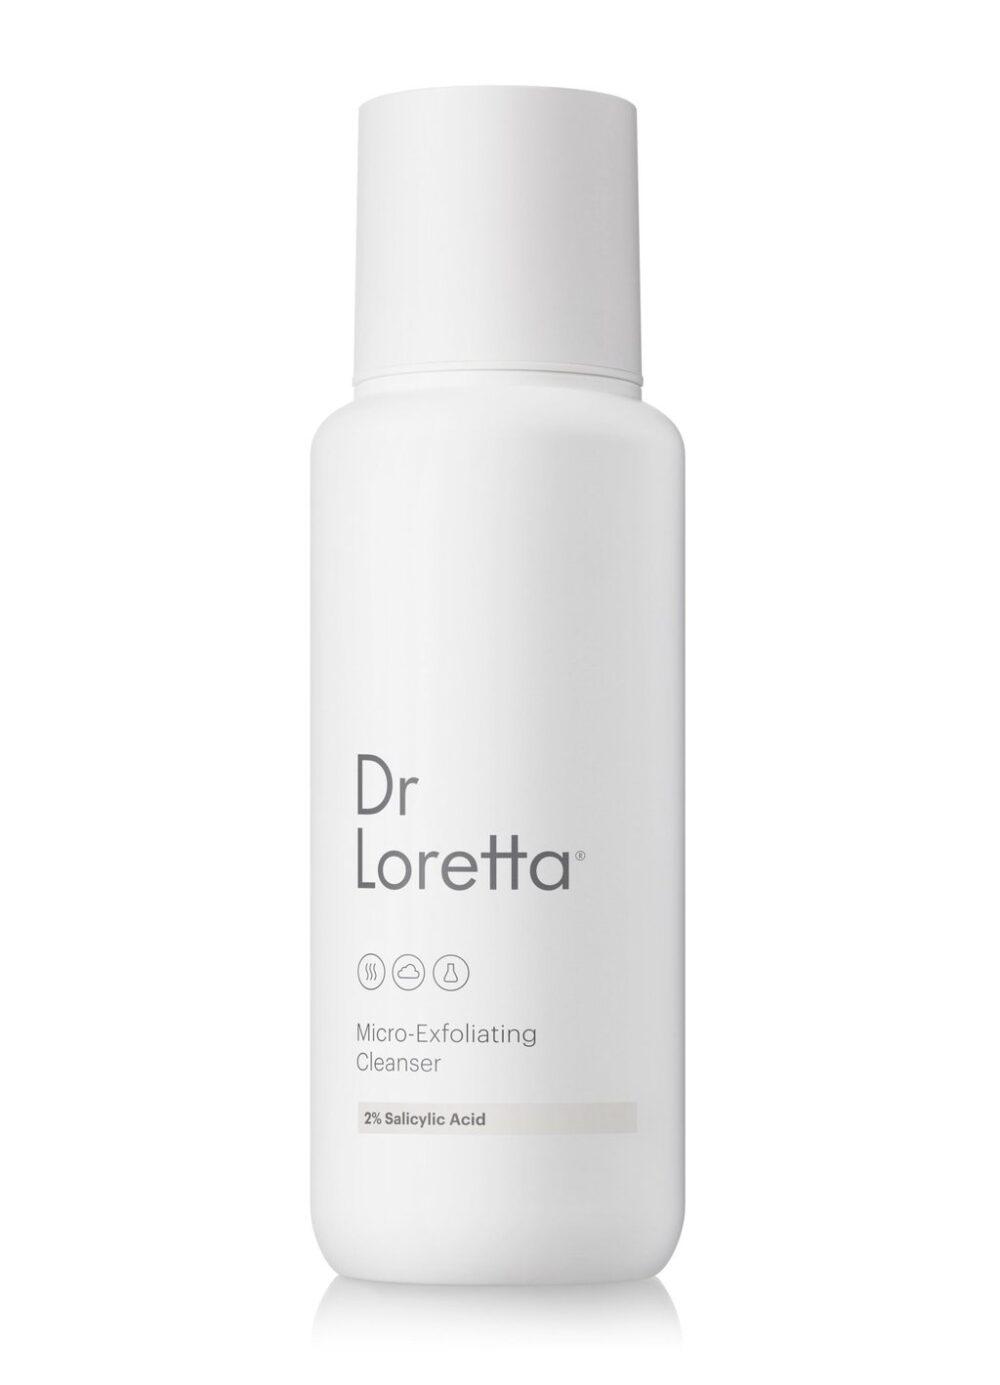 dr loretta Micro-Exfoliating Cleanser